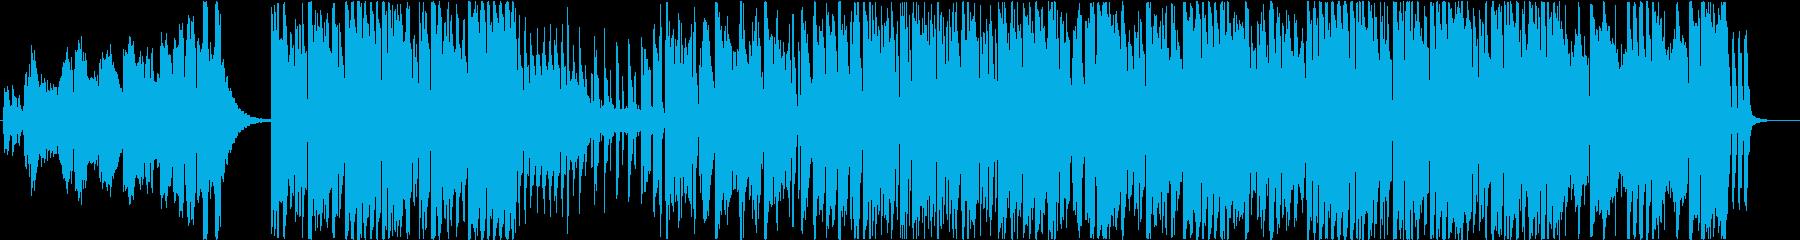 CM】EDM とにかくハッピー感がすごいの再生済みの波形